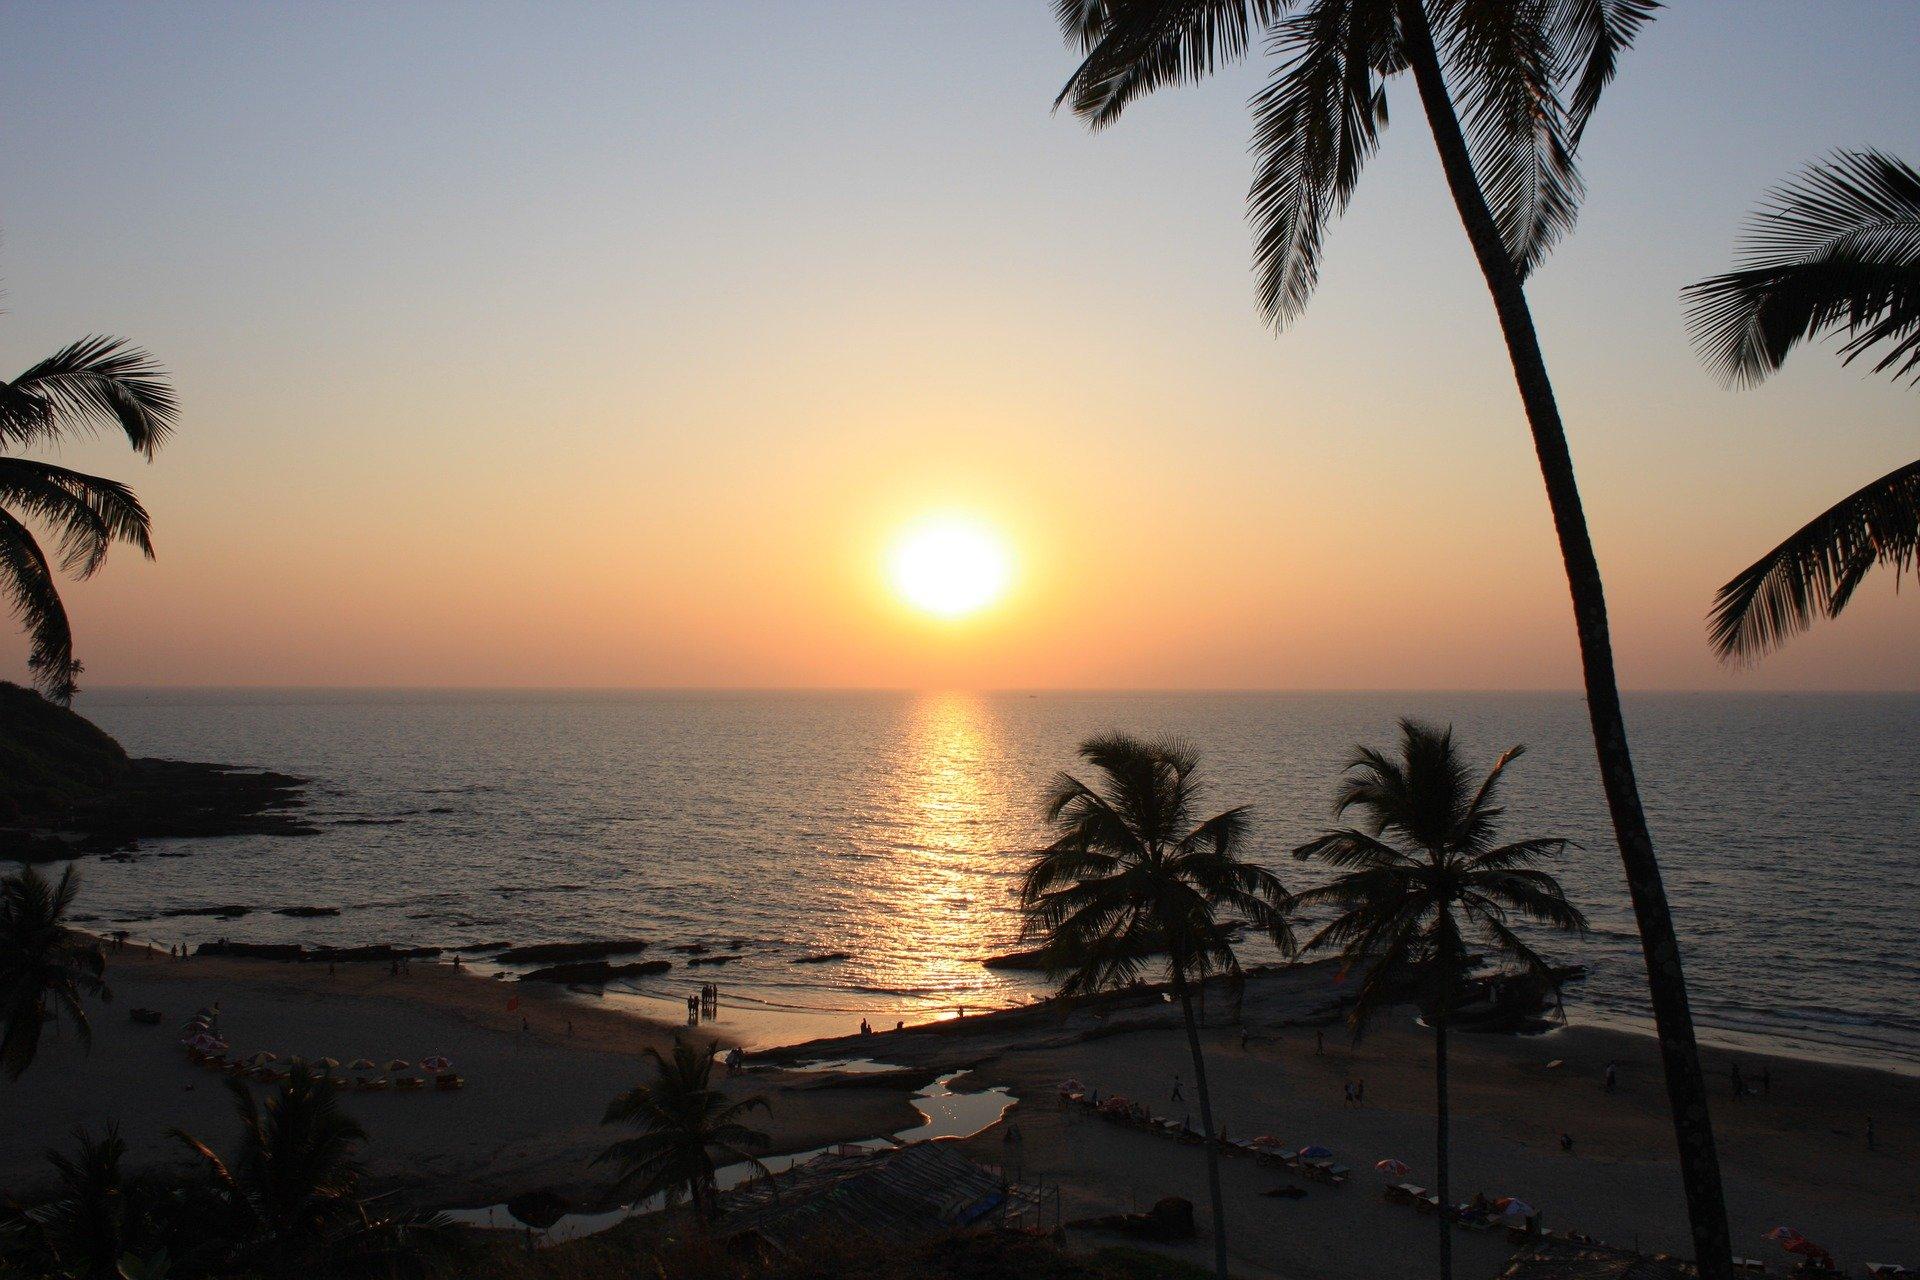 6-Day Pristine Beaches of Goa - India Itinerary